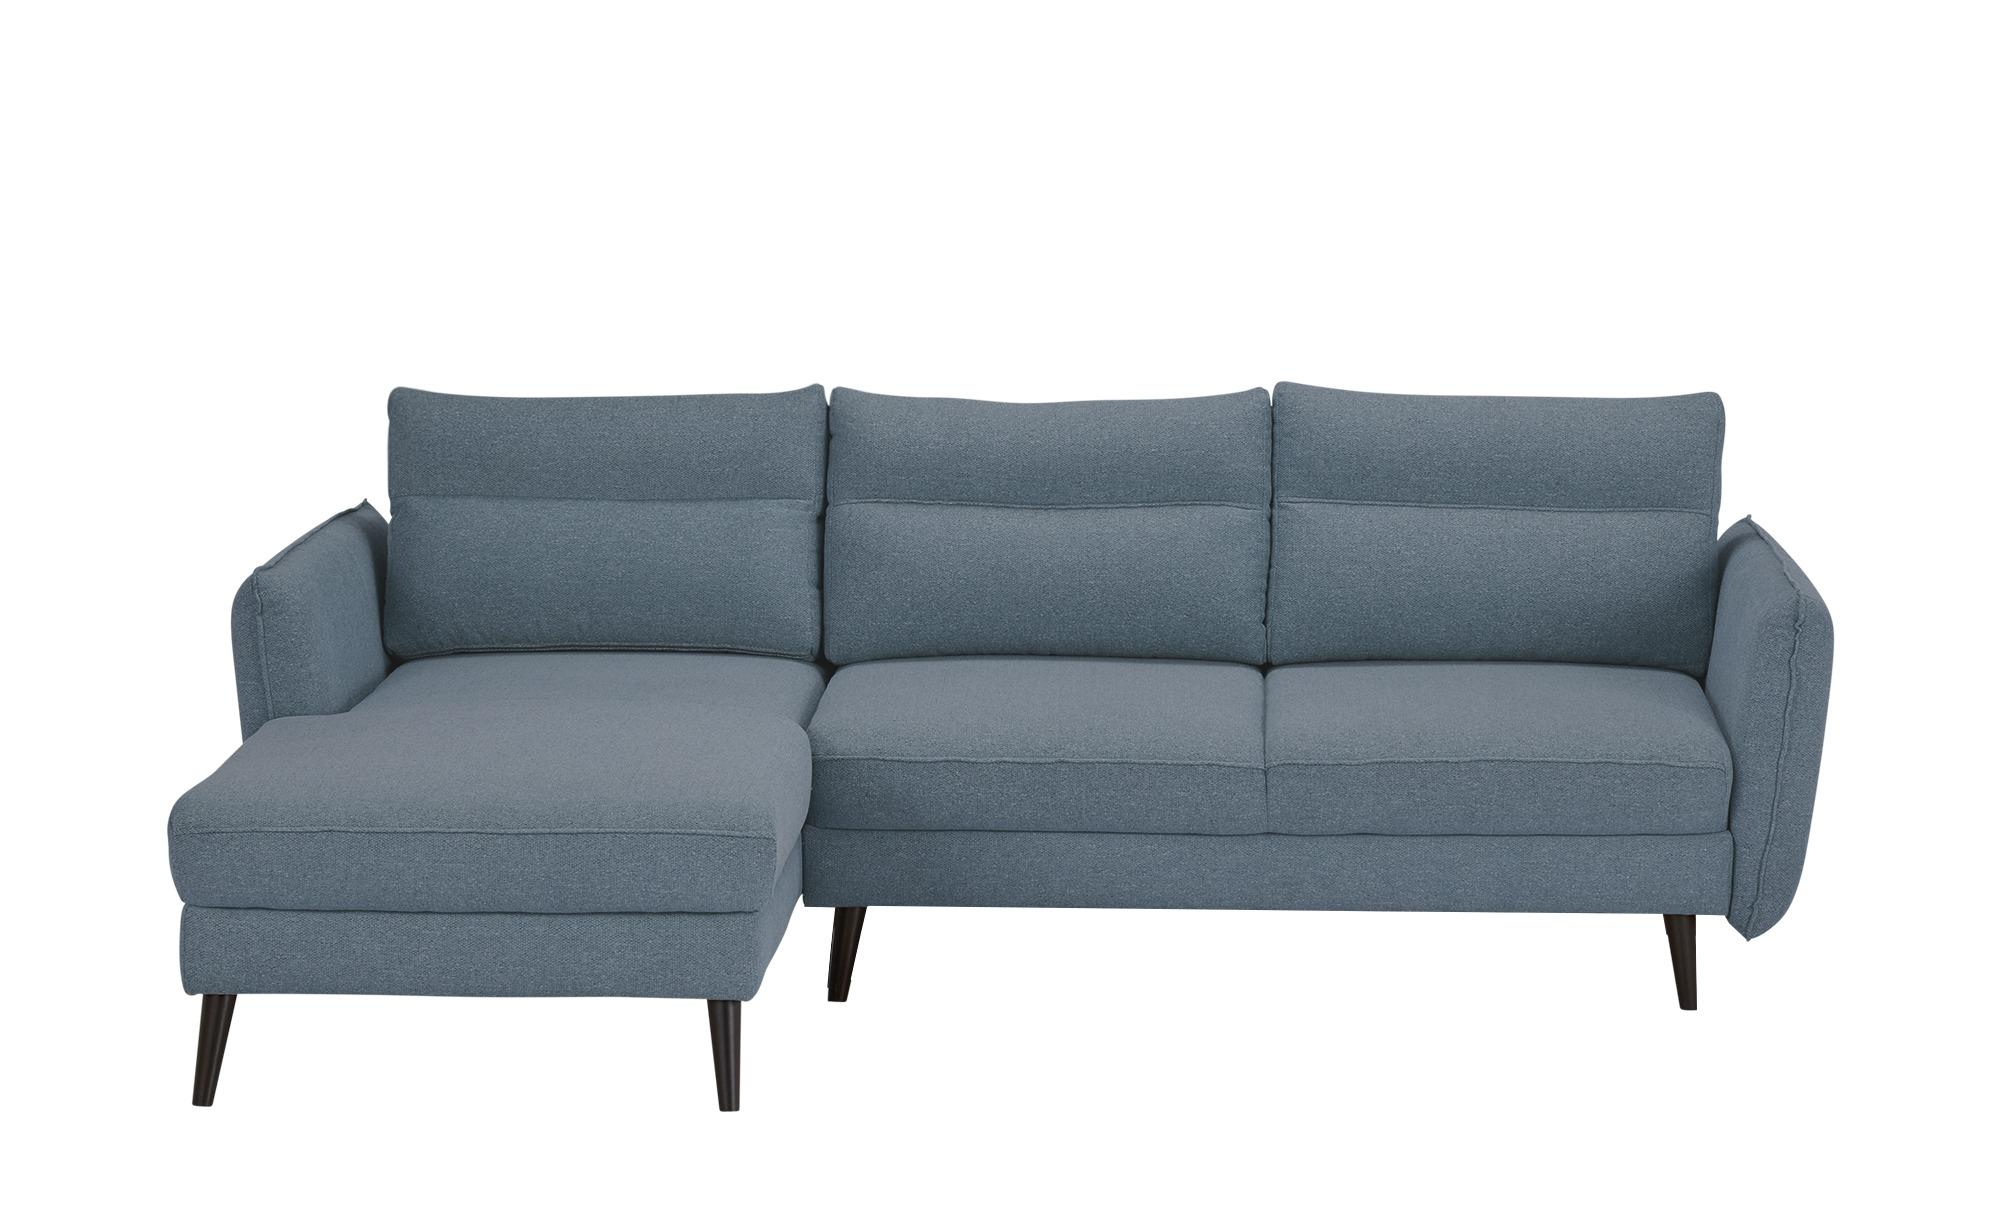 switch Ecksofa  Caramello ¦ blau ¦ Maße (cm): H: 86 Polstermöbel > Sofas > Ecksofas - Höffner